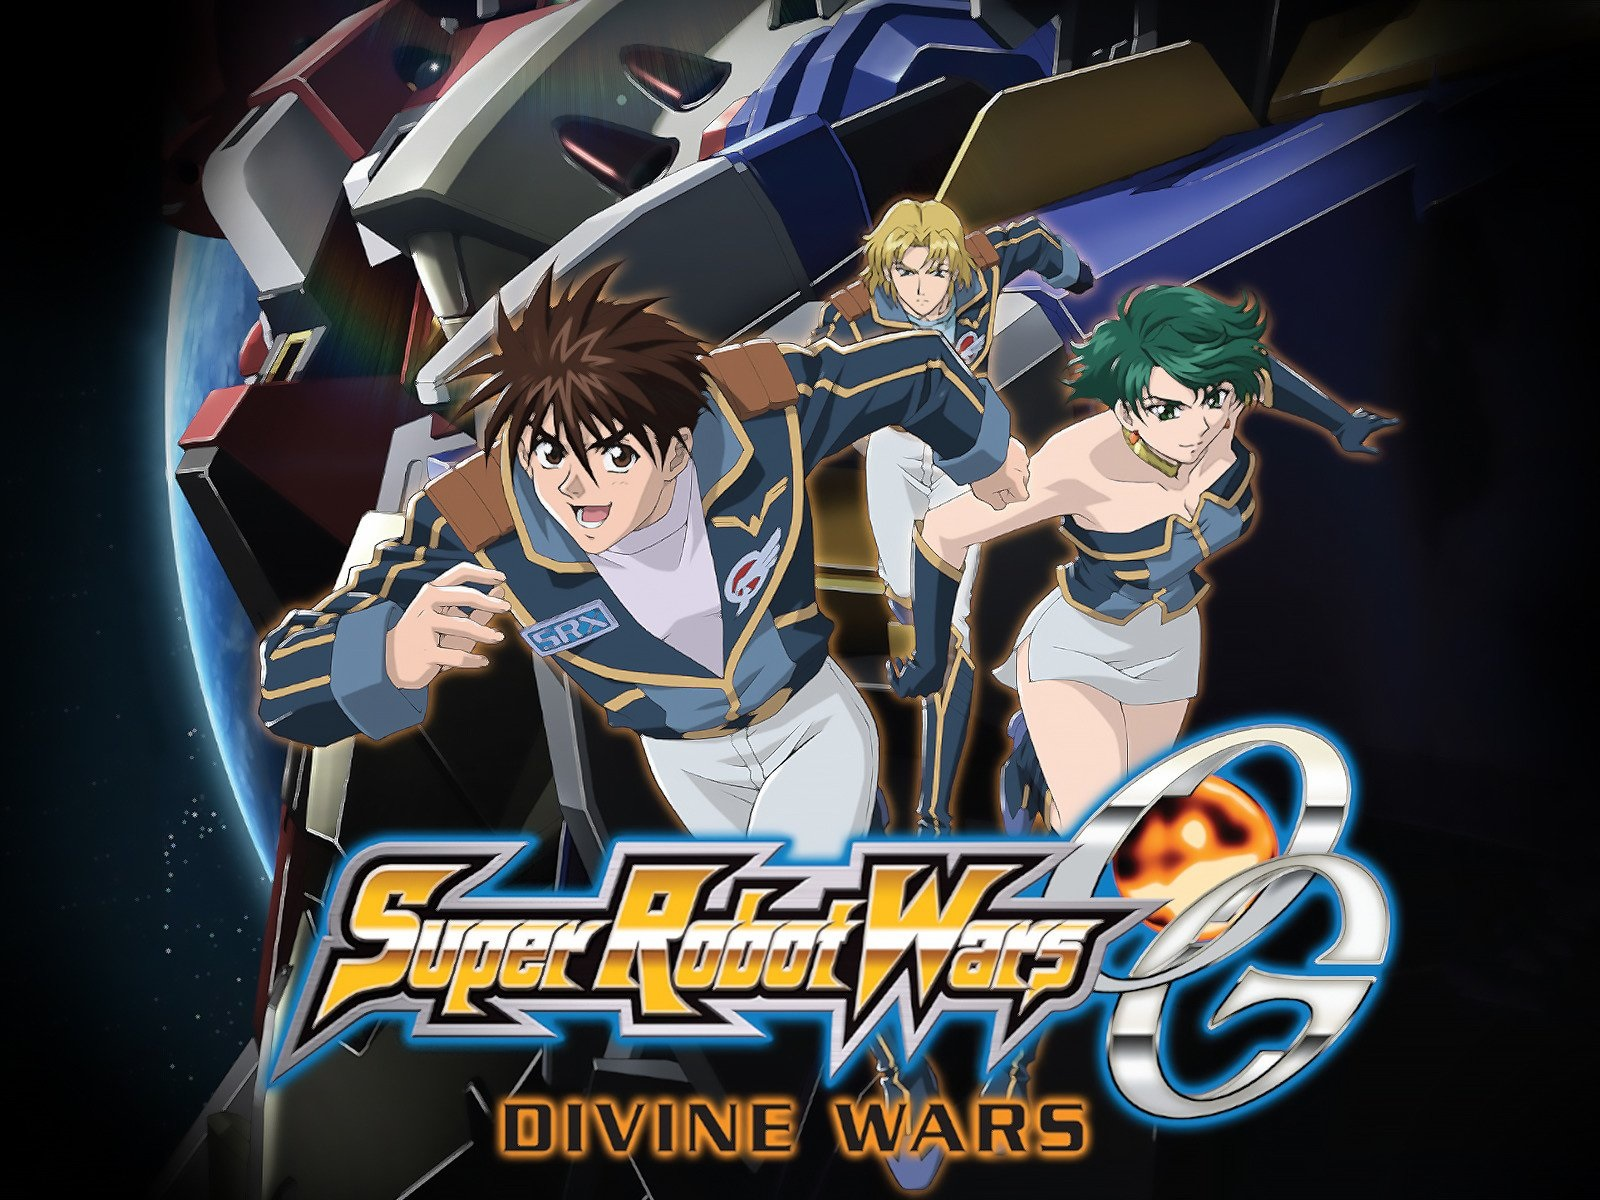 Super Robot Wars Original Generation: Divine Wars